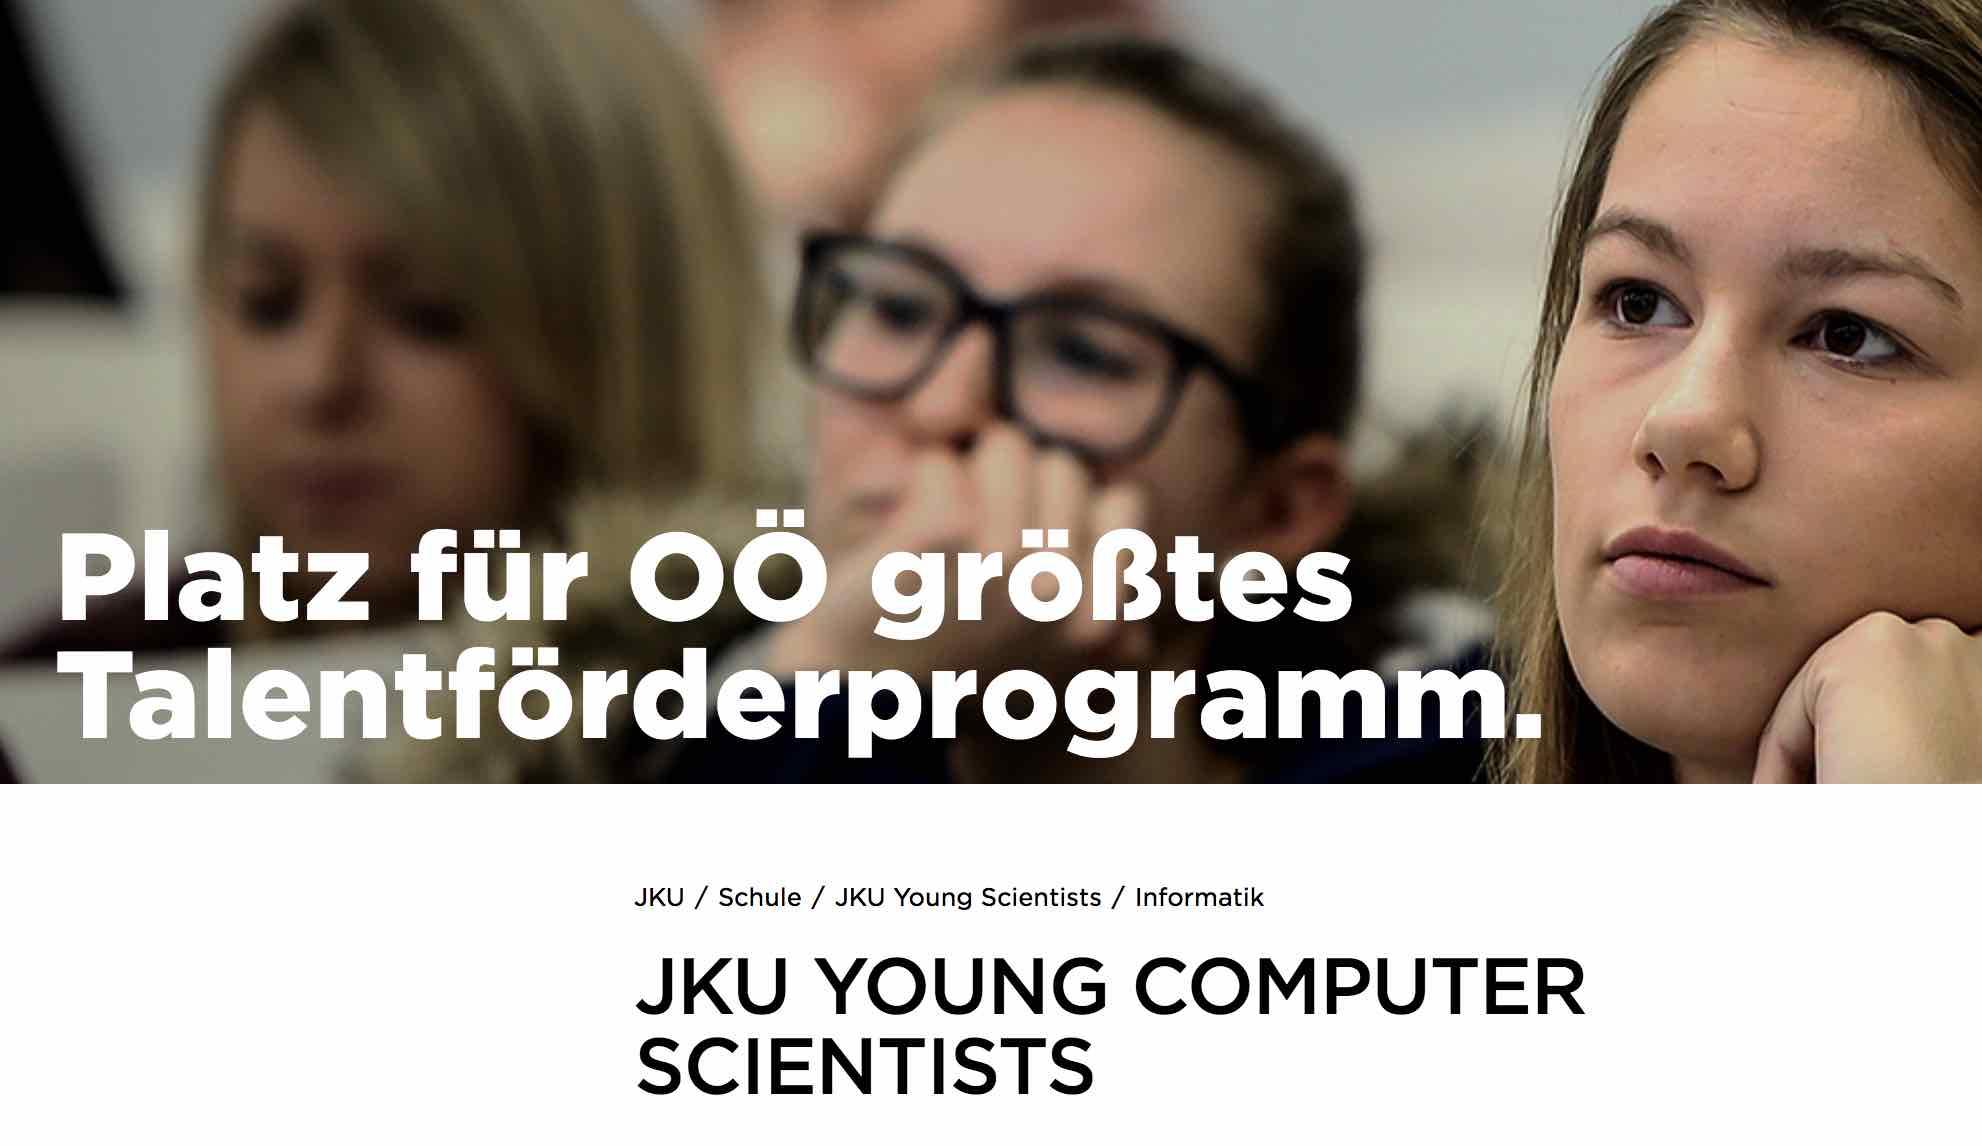 JKU Linz: Young Computer Scientists